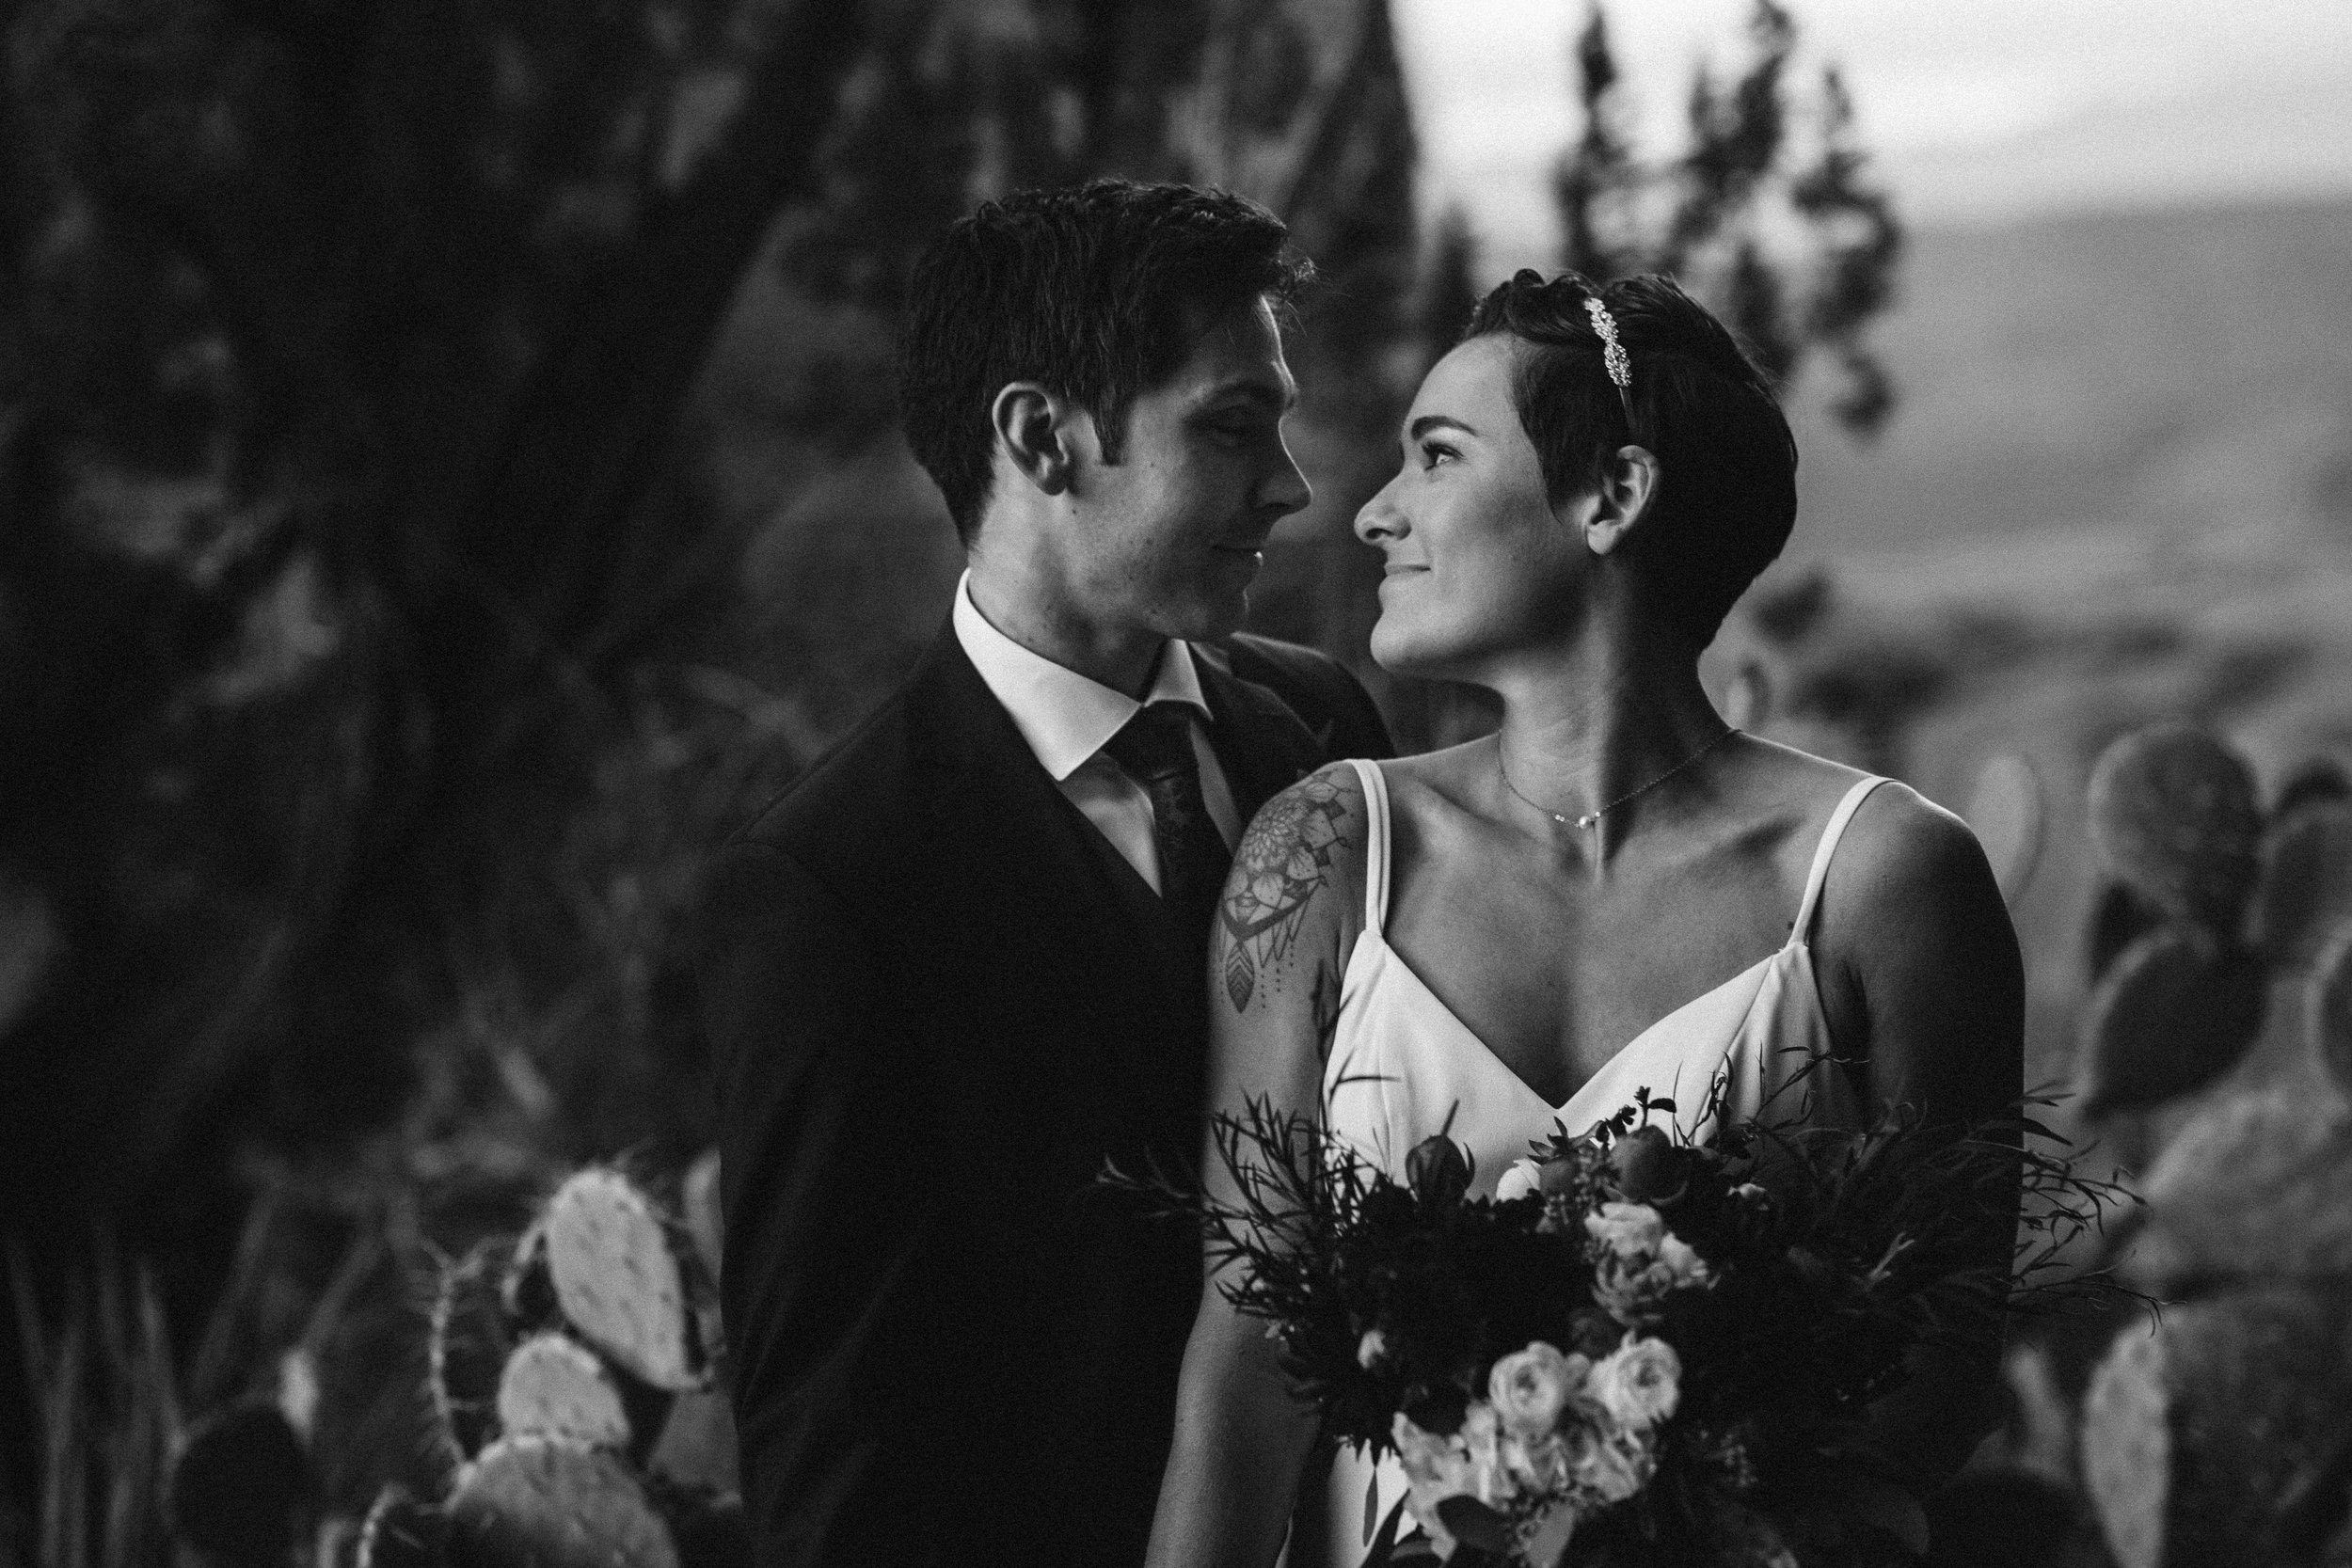 nicole-daacke-photography-sedona-arizona-destination-elopement-wedding-photographer-catherdral-rock-hiking-elopement-sedona-river-elopement-photos-desert-rock-wedding-photographer-laid-back-spontaneous-elopement-29.jpg